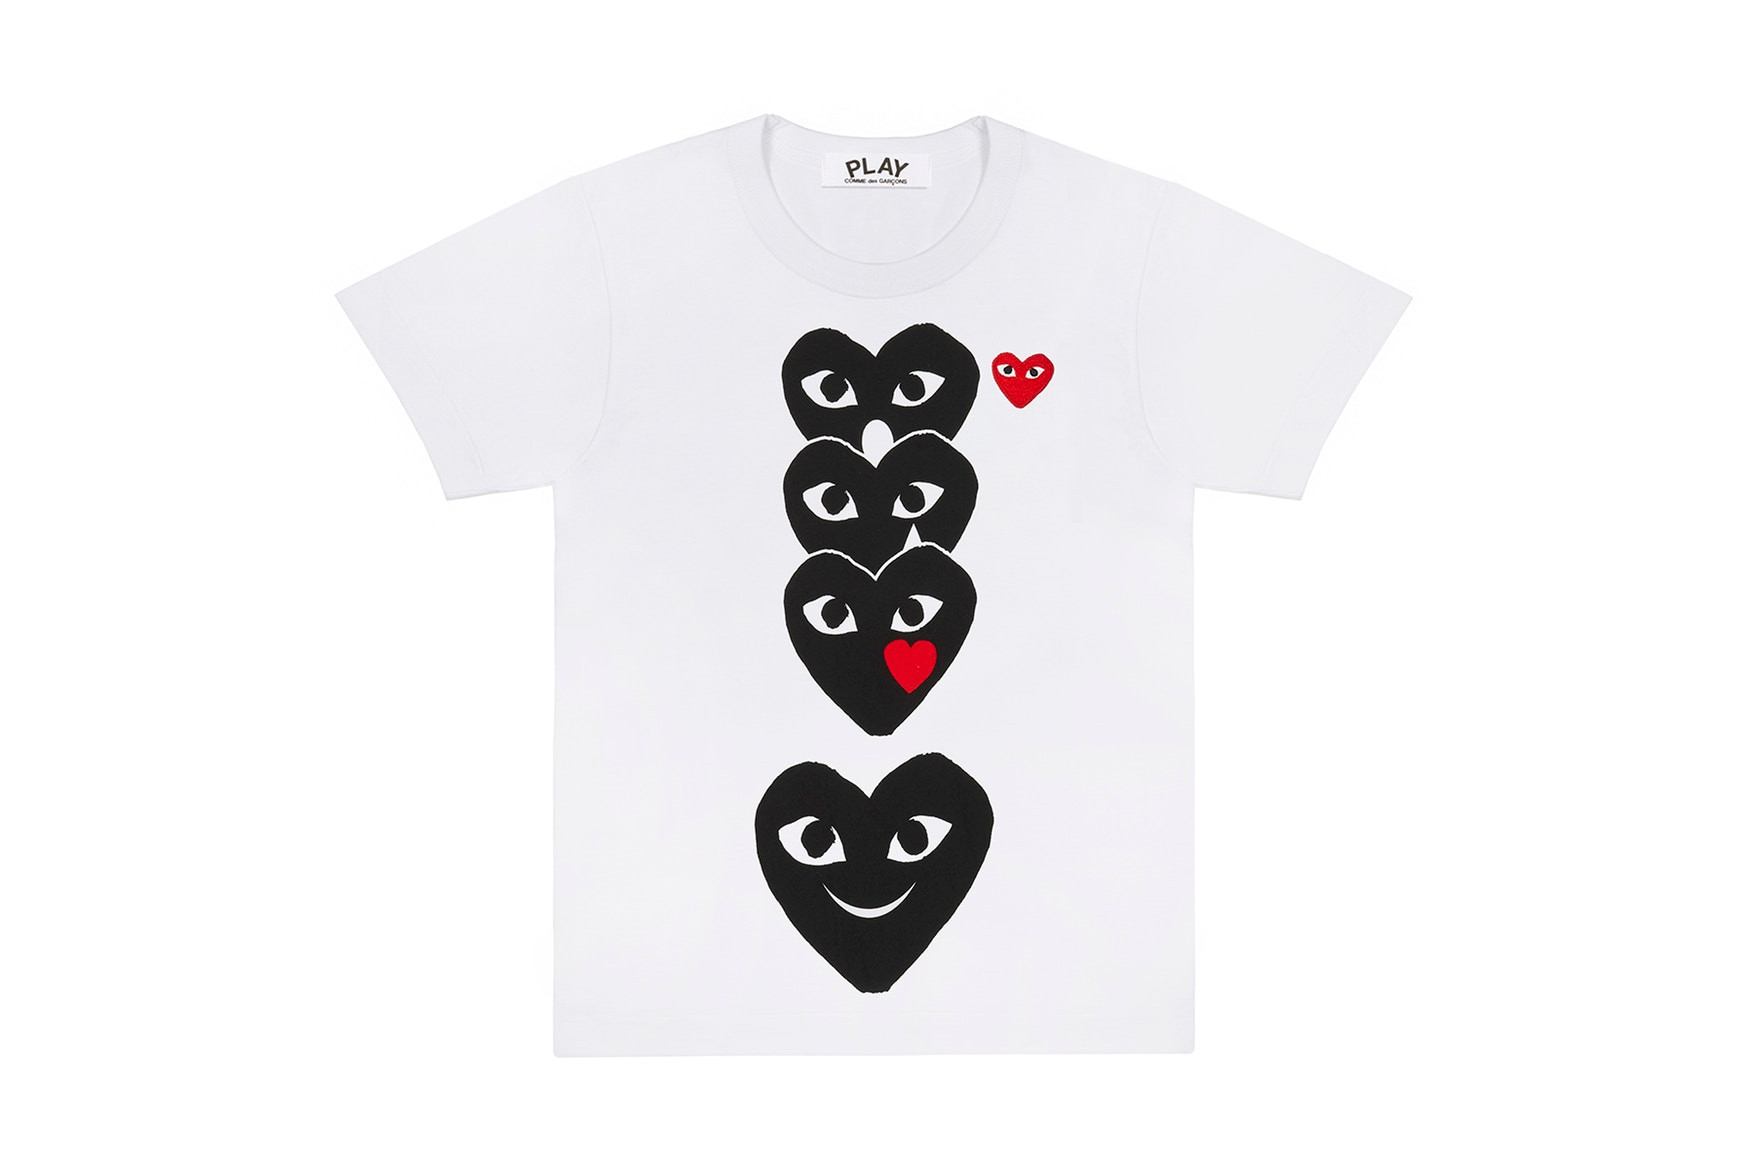 COMME des GARÇONS PLAY Emoji T-Shirt